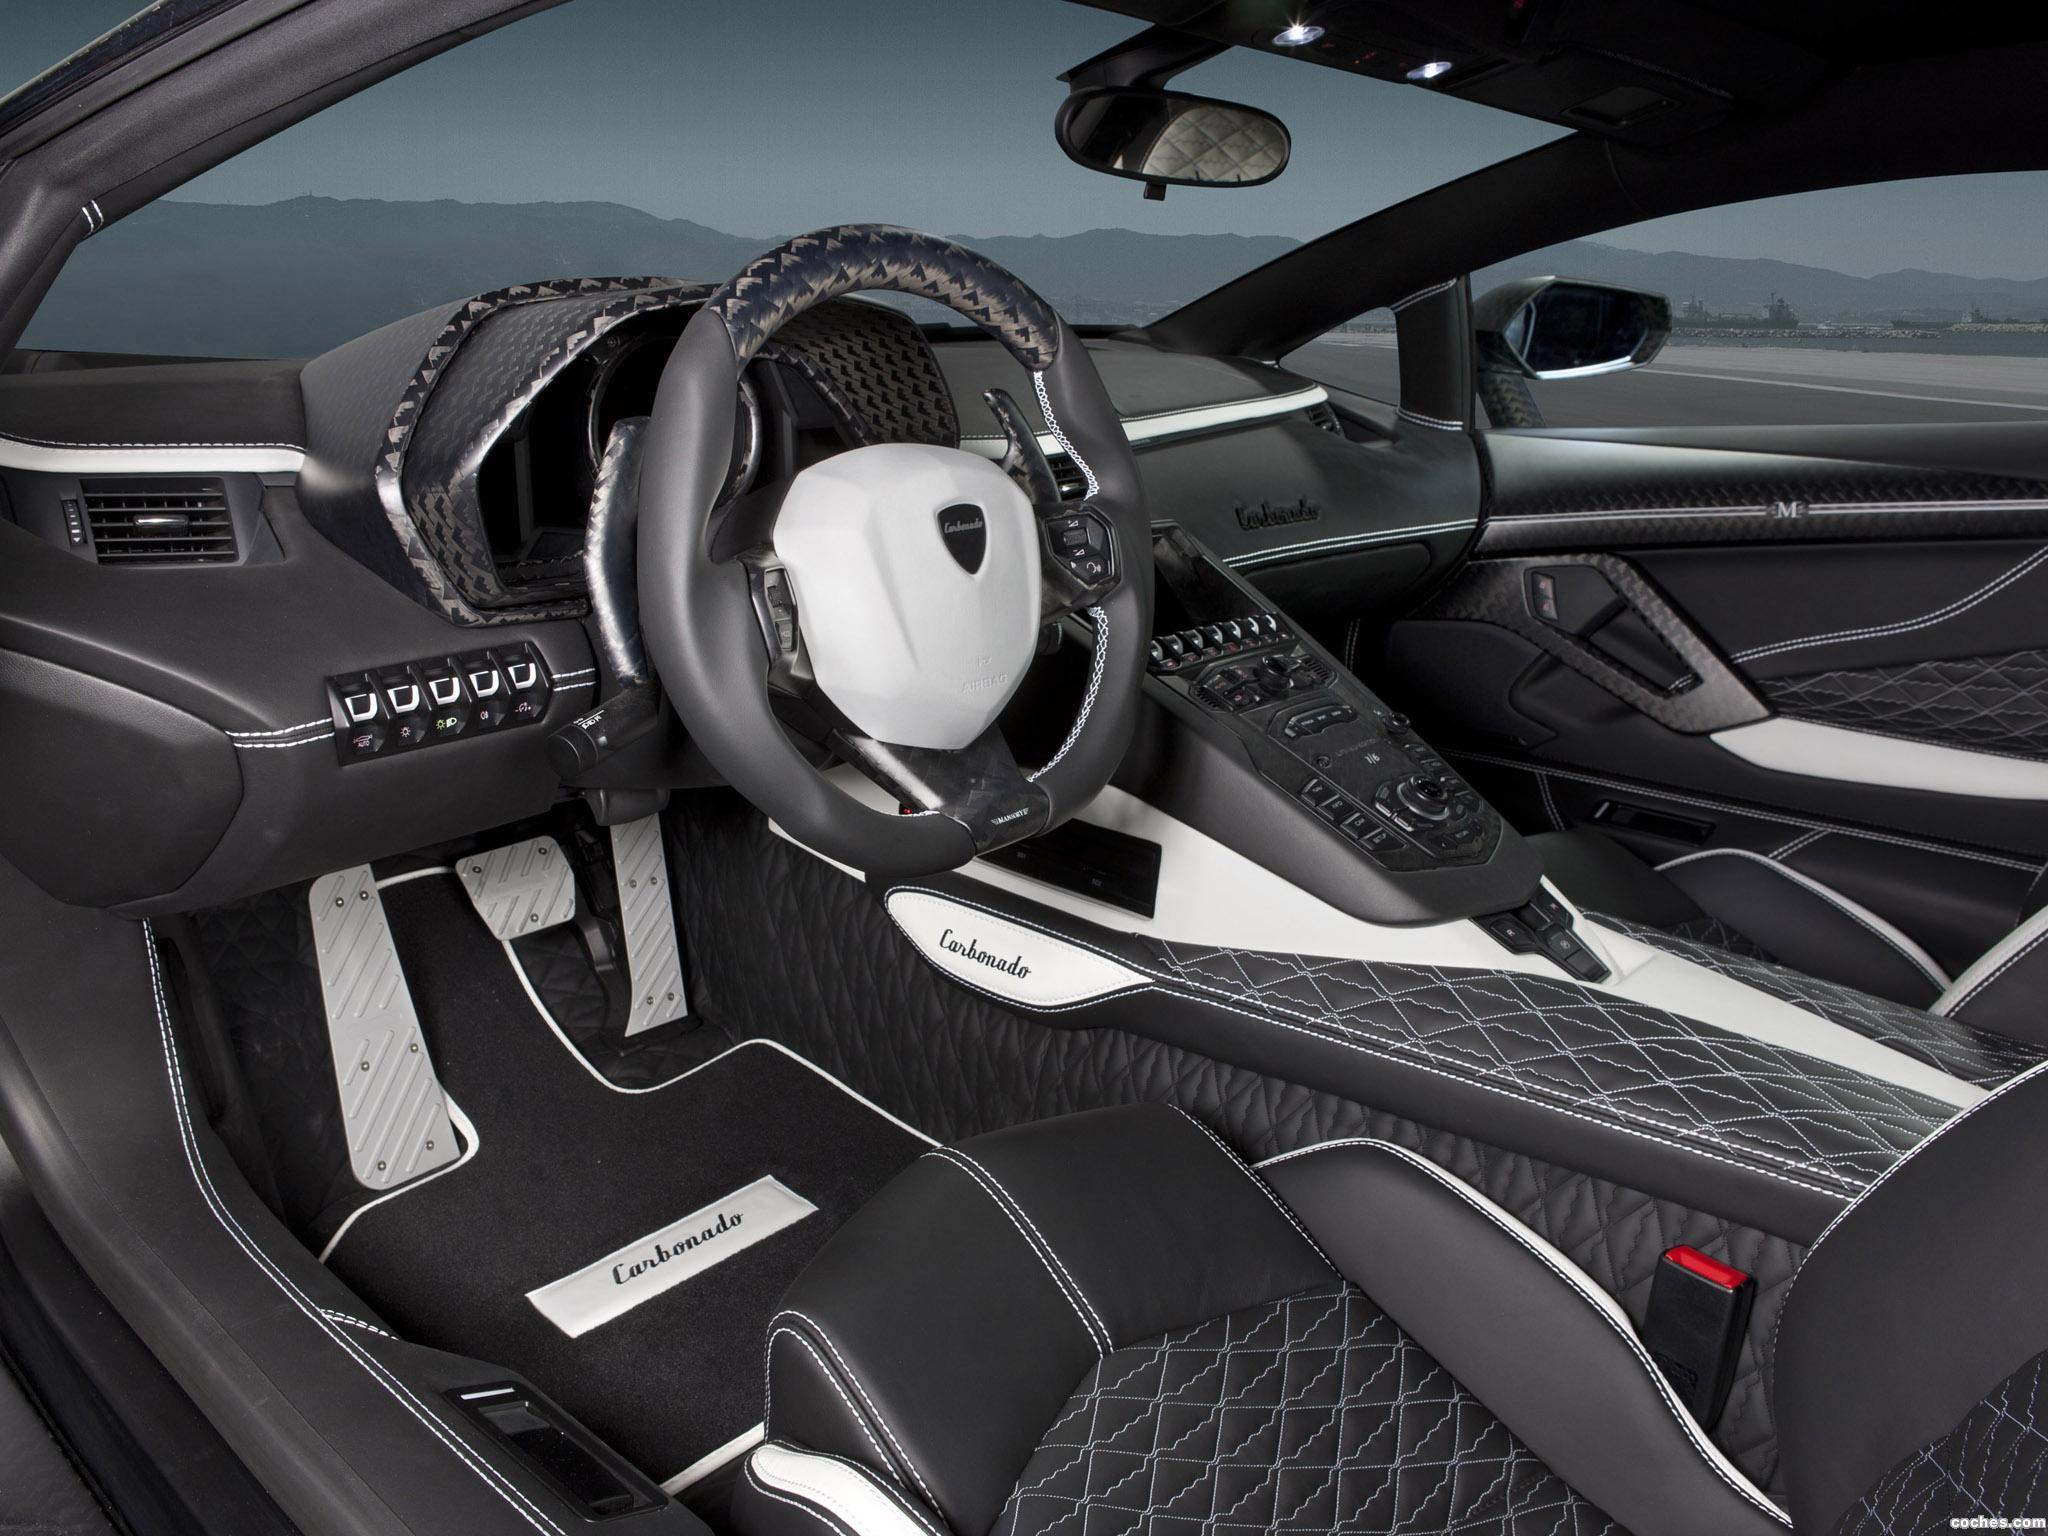 Foto 3 de Mansory Lamborghini Aventador LP700-4 Carbonado 2013